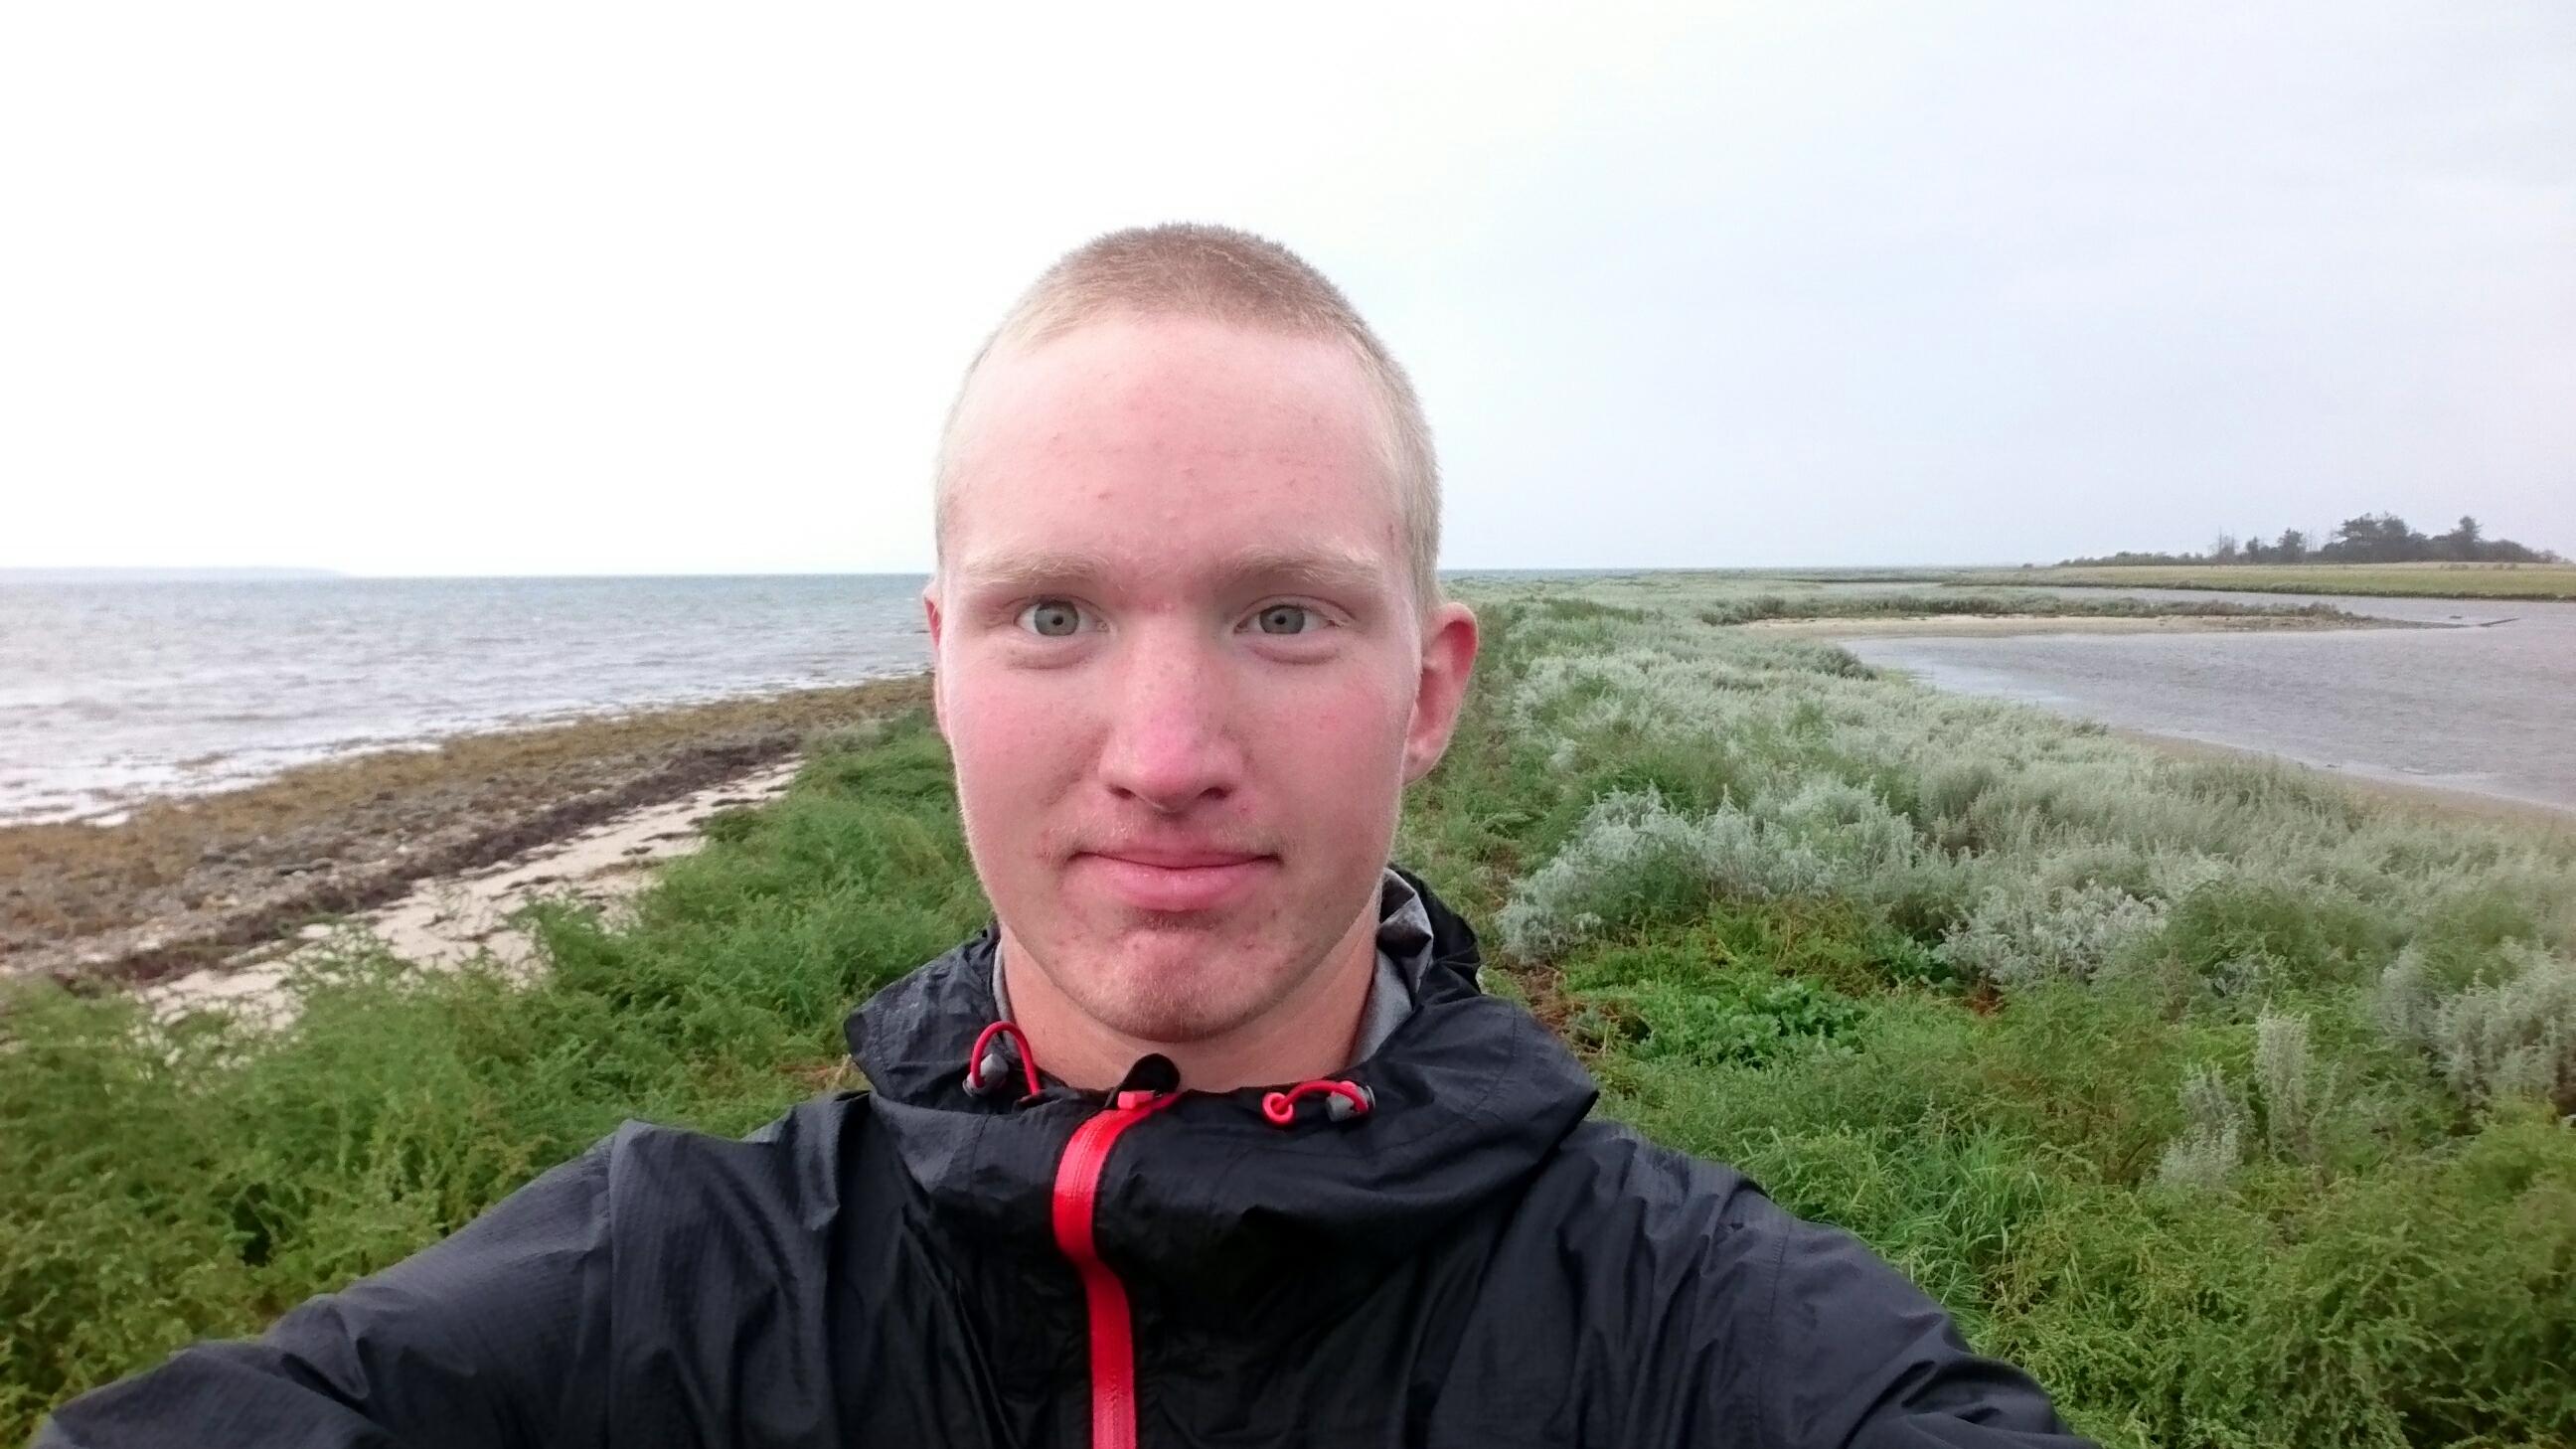 Hjarnø